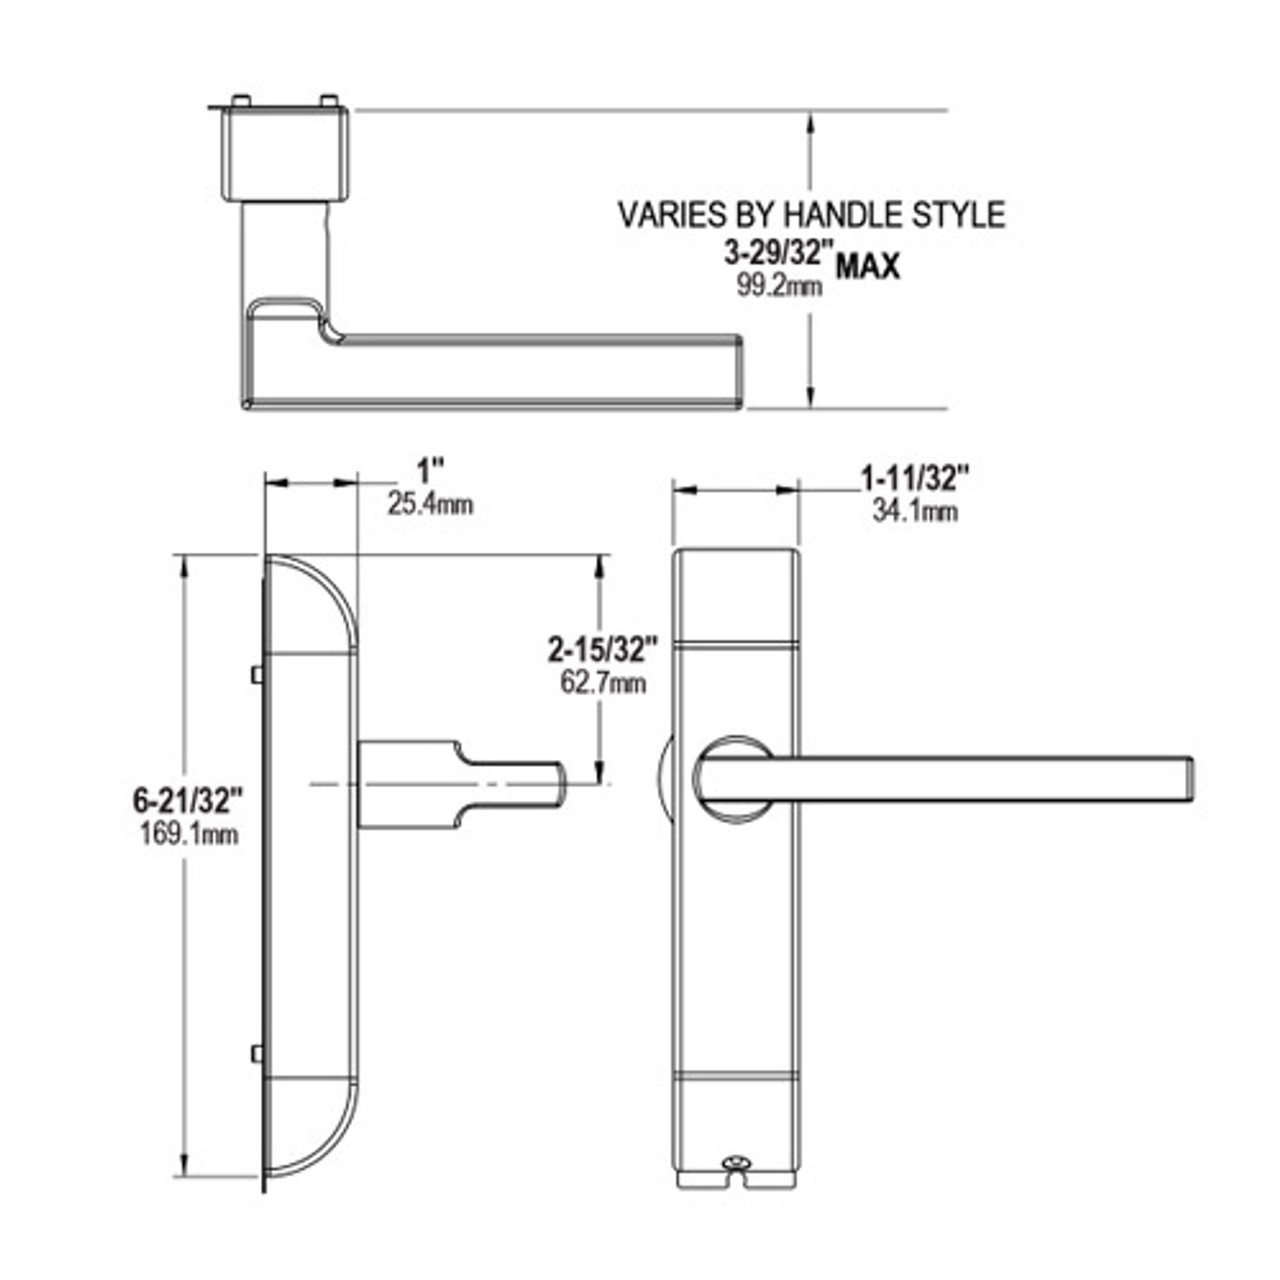 4600M-MI-641-US3 Adams Rite MI Designer handle Dimensional View